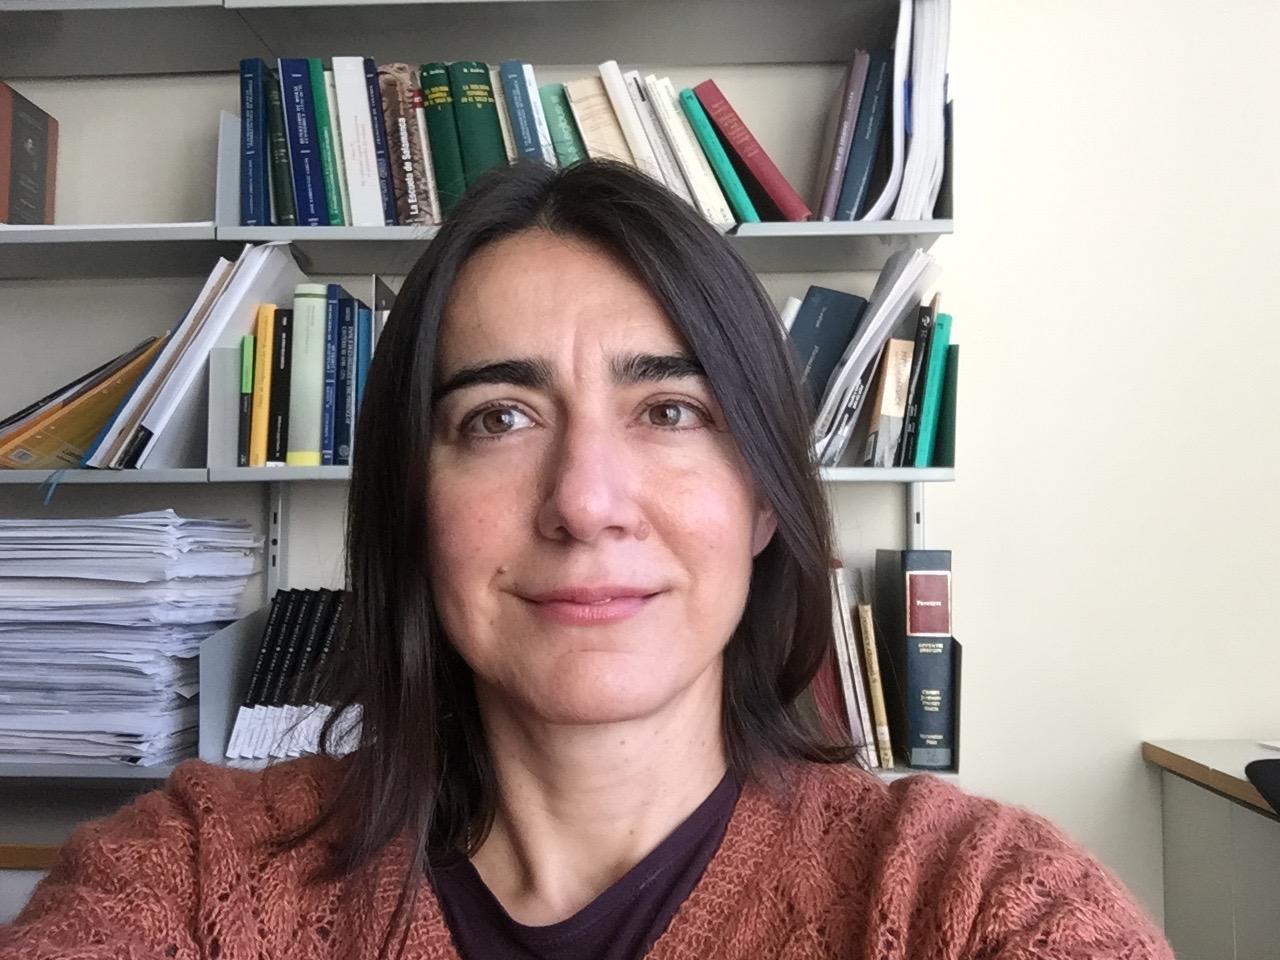 Mónica García-Salmones, University of Helsinki